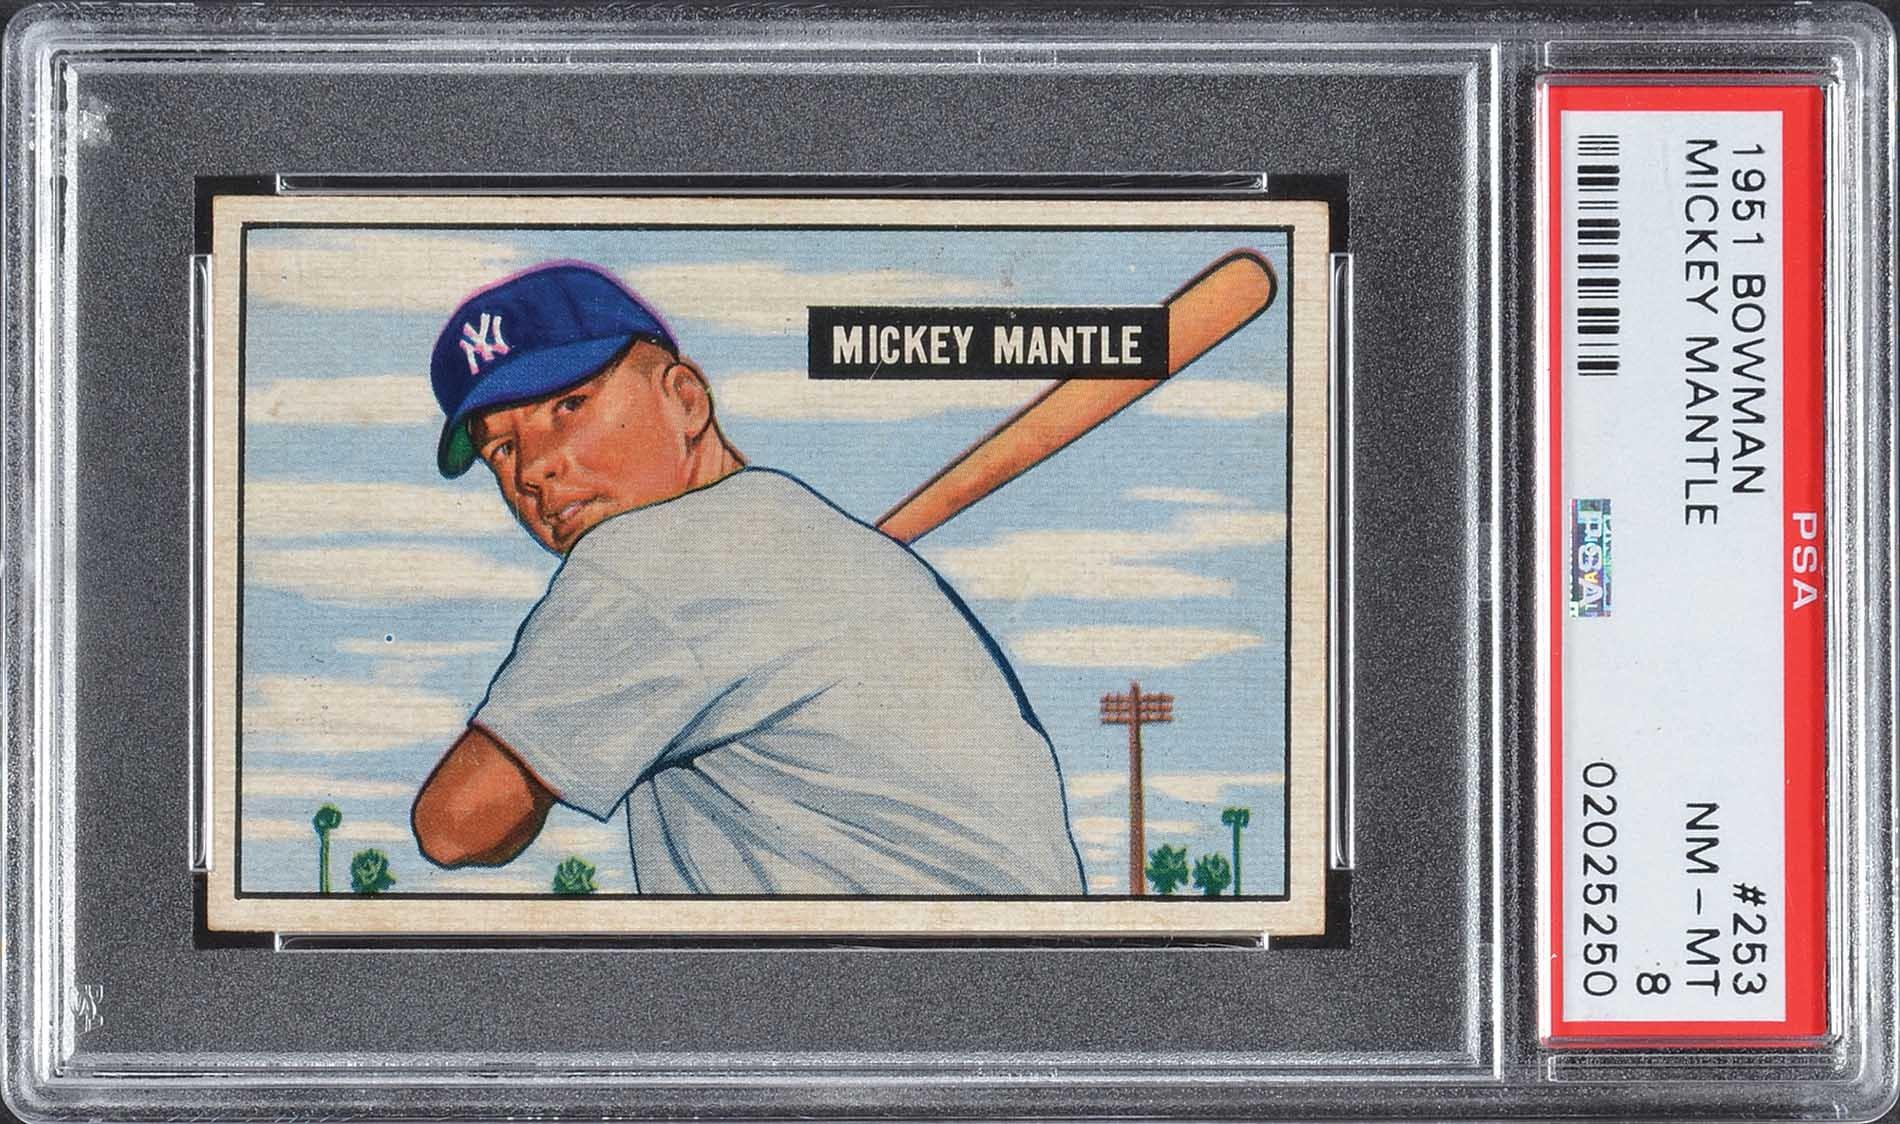 1951 Bowman 253 Mickey Mantle Rookie Psa Nm Mt 8